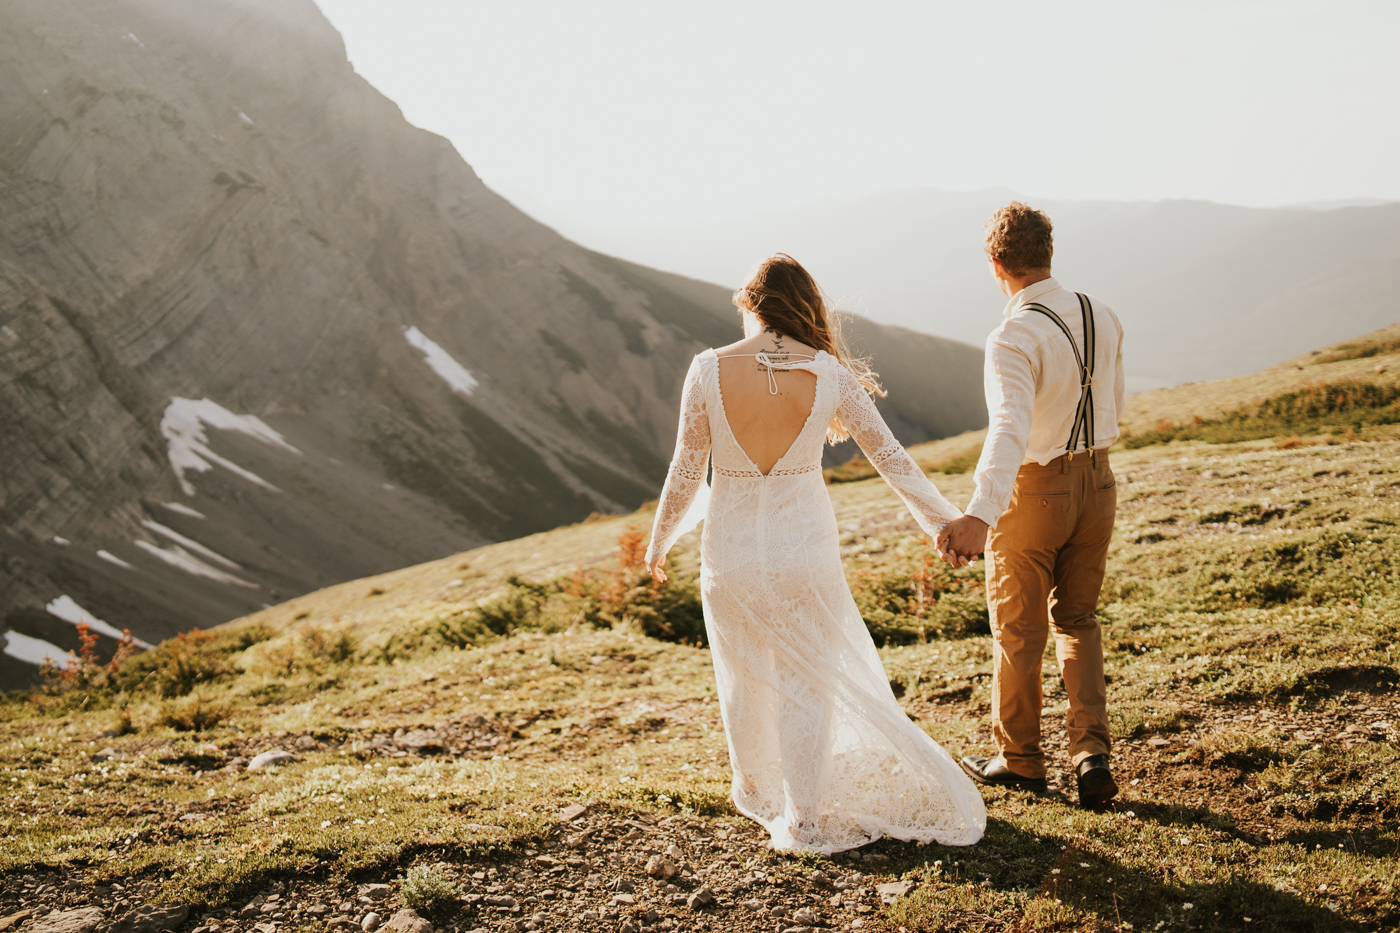 tyraephotography_photographer_wedding_elopement_engagement_photography-08502.jpg